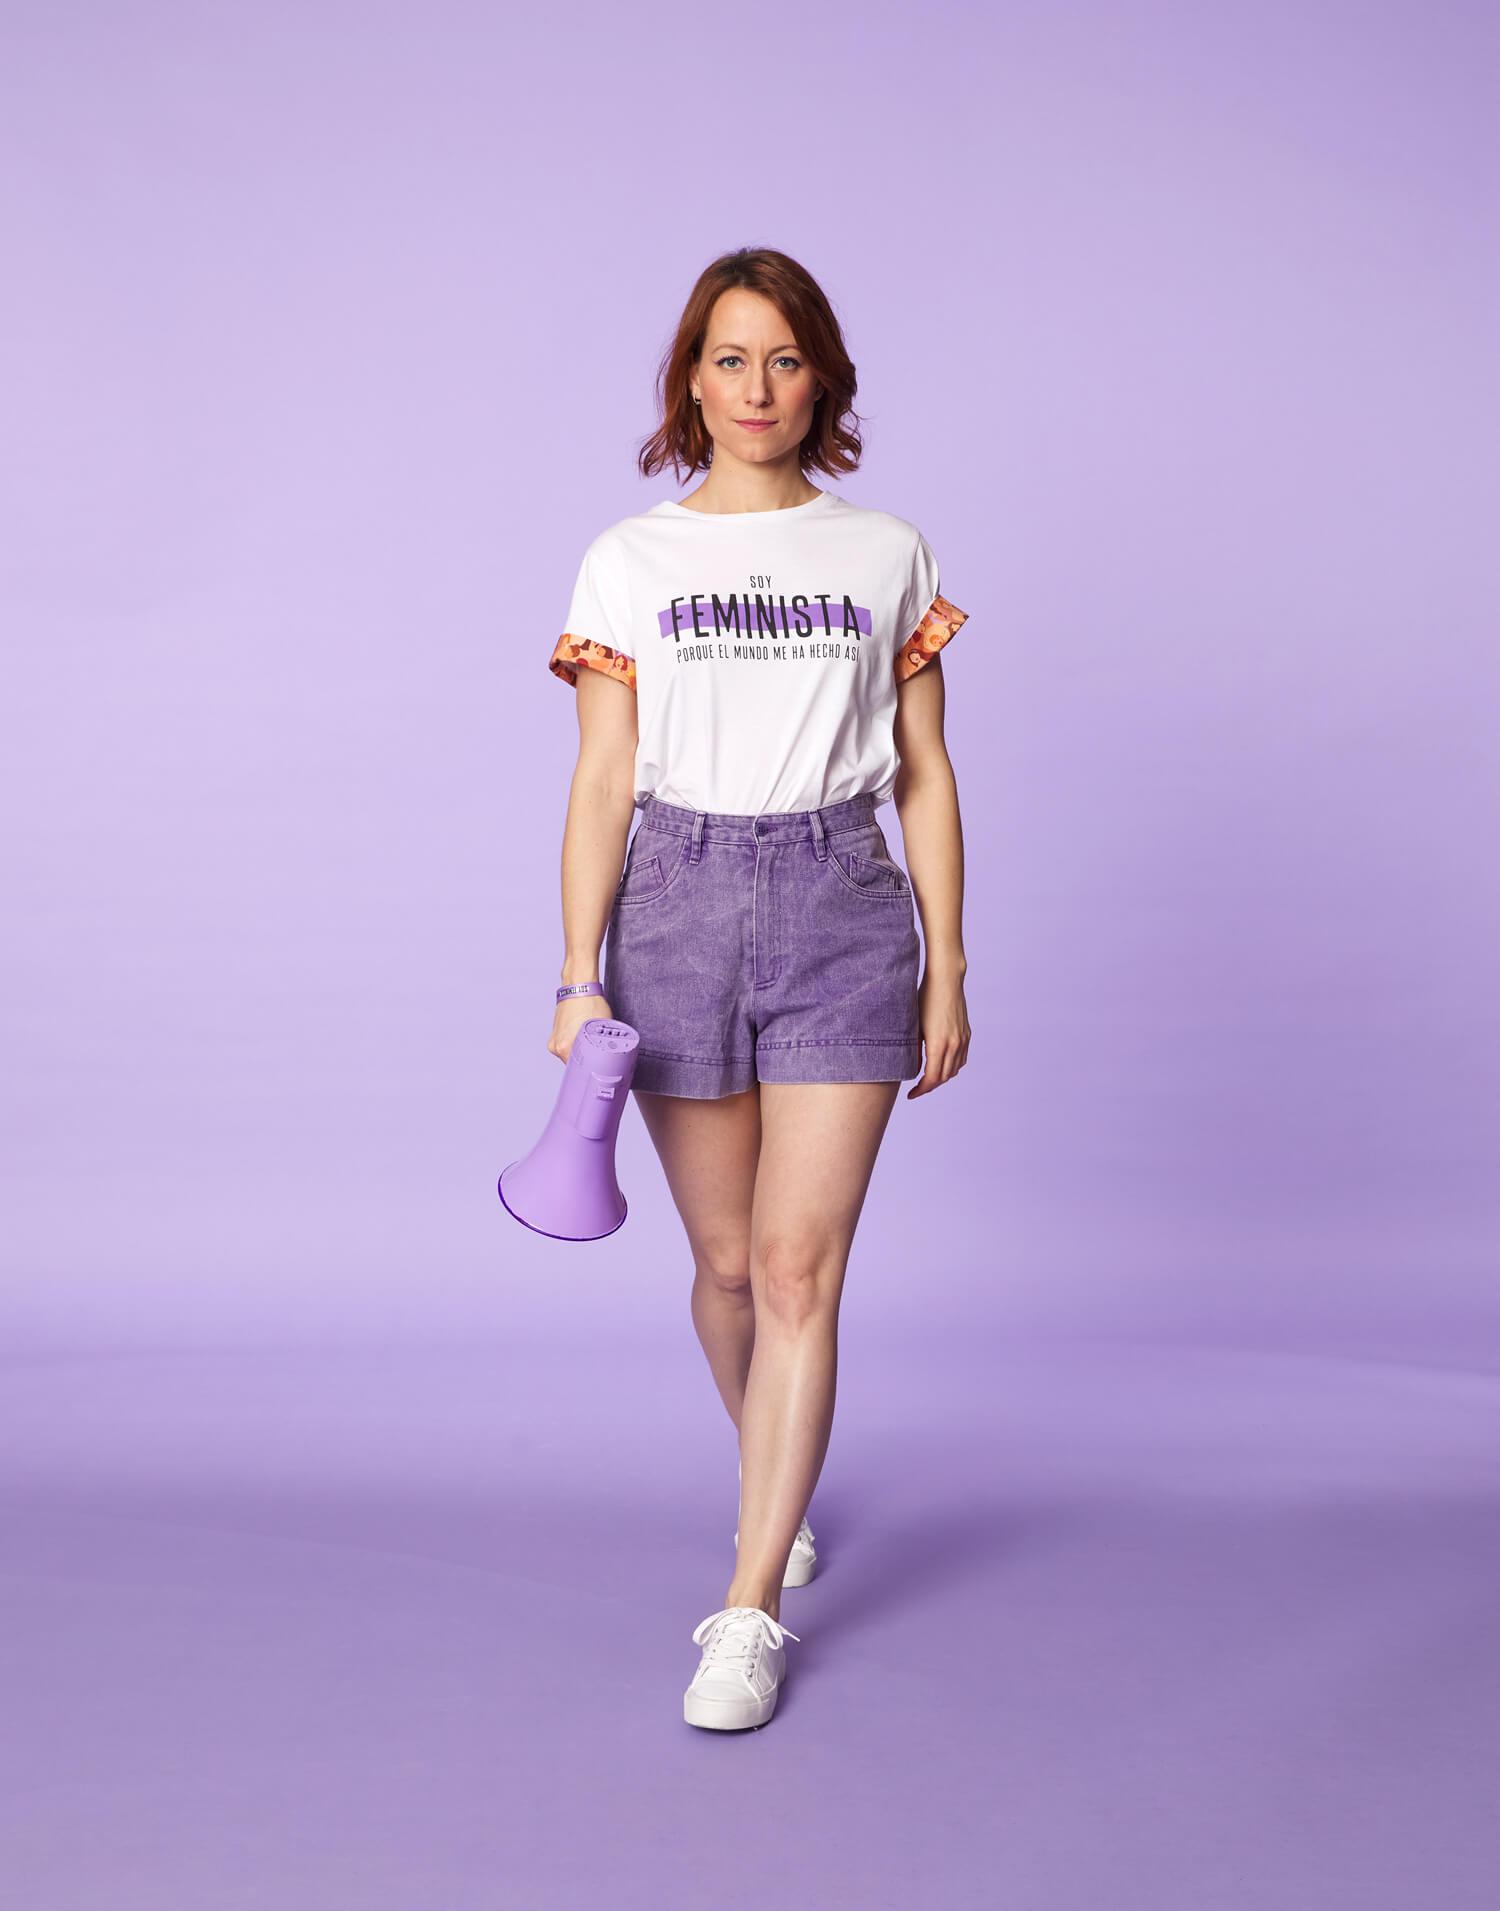 Camiseta 'Soy Feminista' 2020